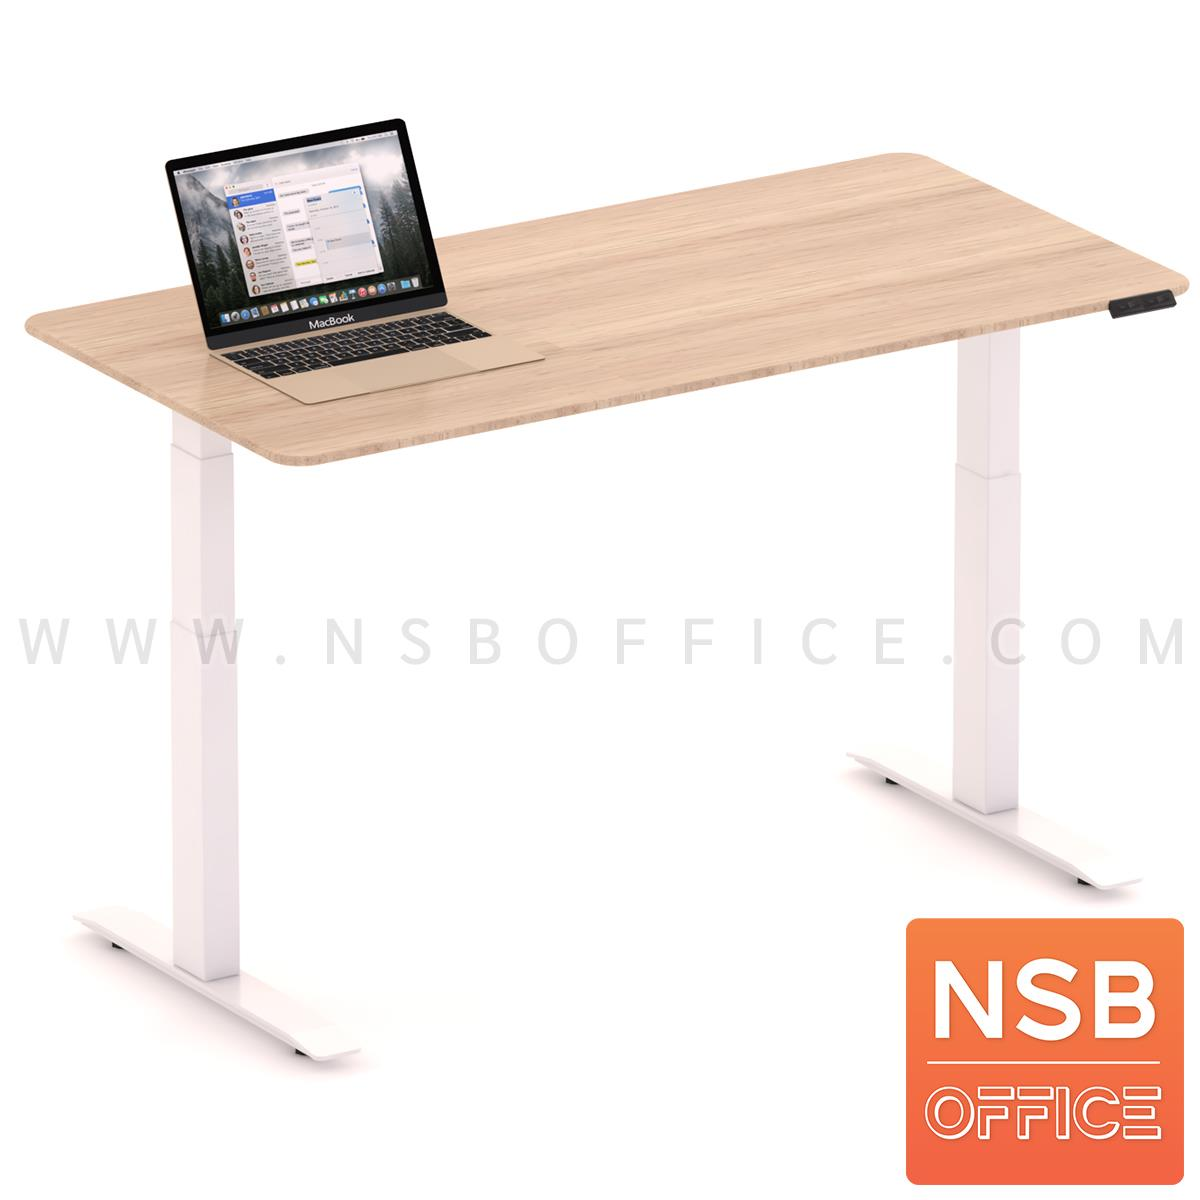 A44A005:โต๊ะทำงาน Sit 2 Stand ระบบไฟฟ้า  รุ่น Civic (ซีวิค)  ขนาด 150W, 180W cm. หน้าท็อปไม้ยางพารา